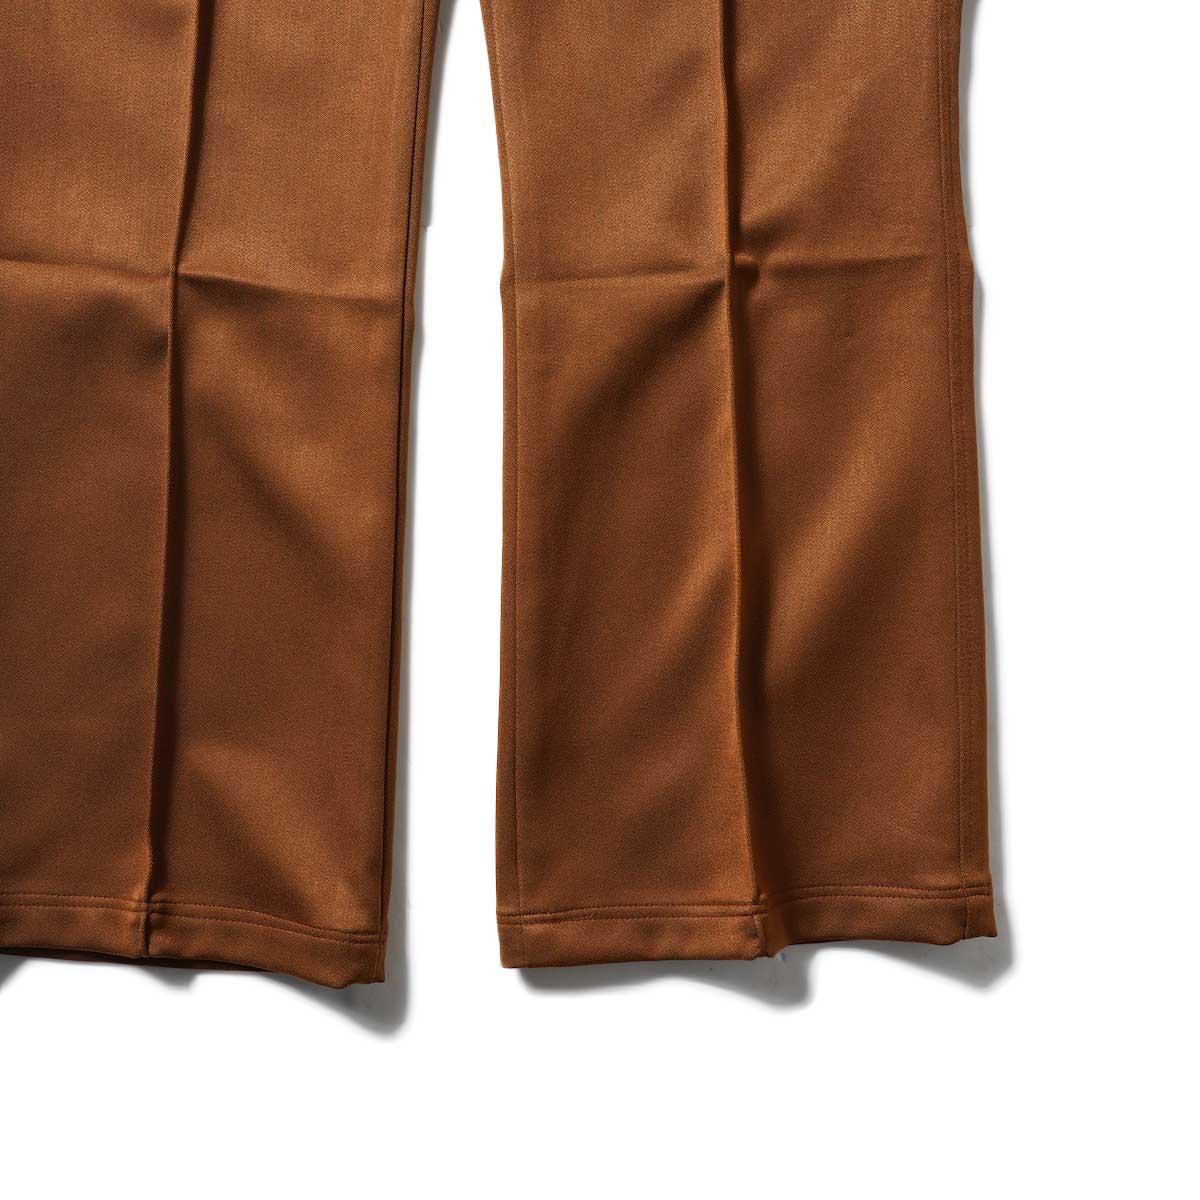 Needles / W.U. BOOT-CUT PANT - PE/R DOESKIN (Brown)裾